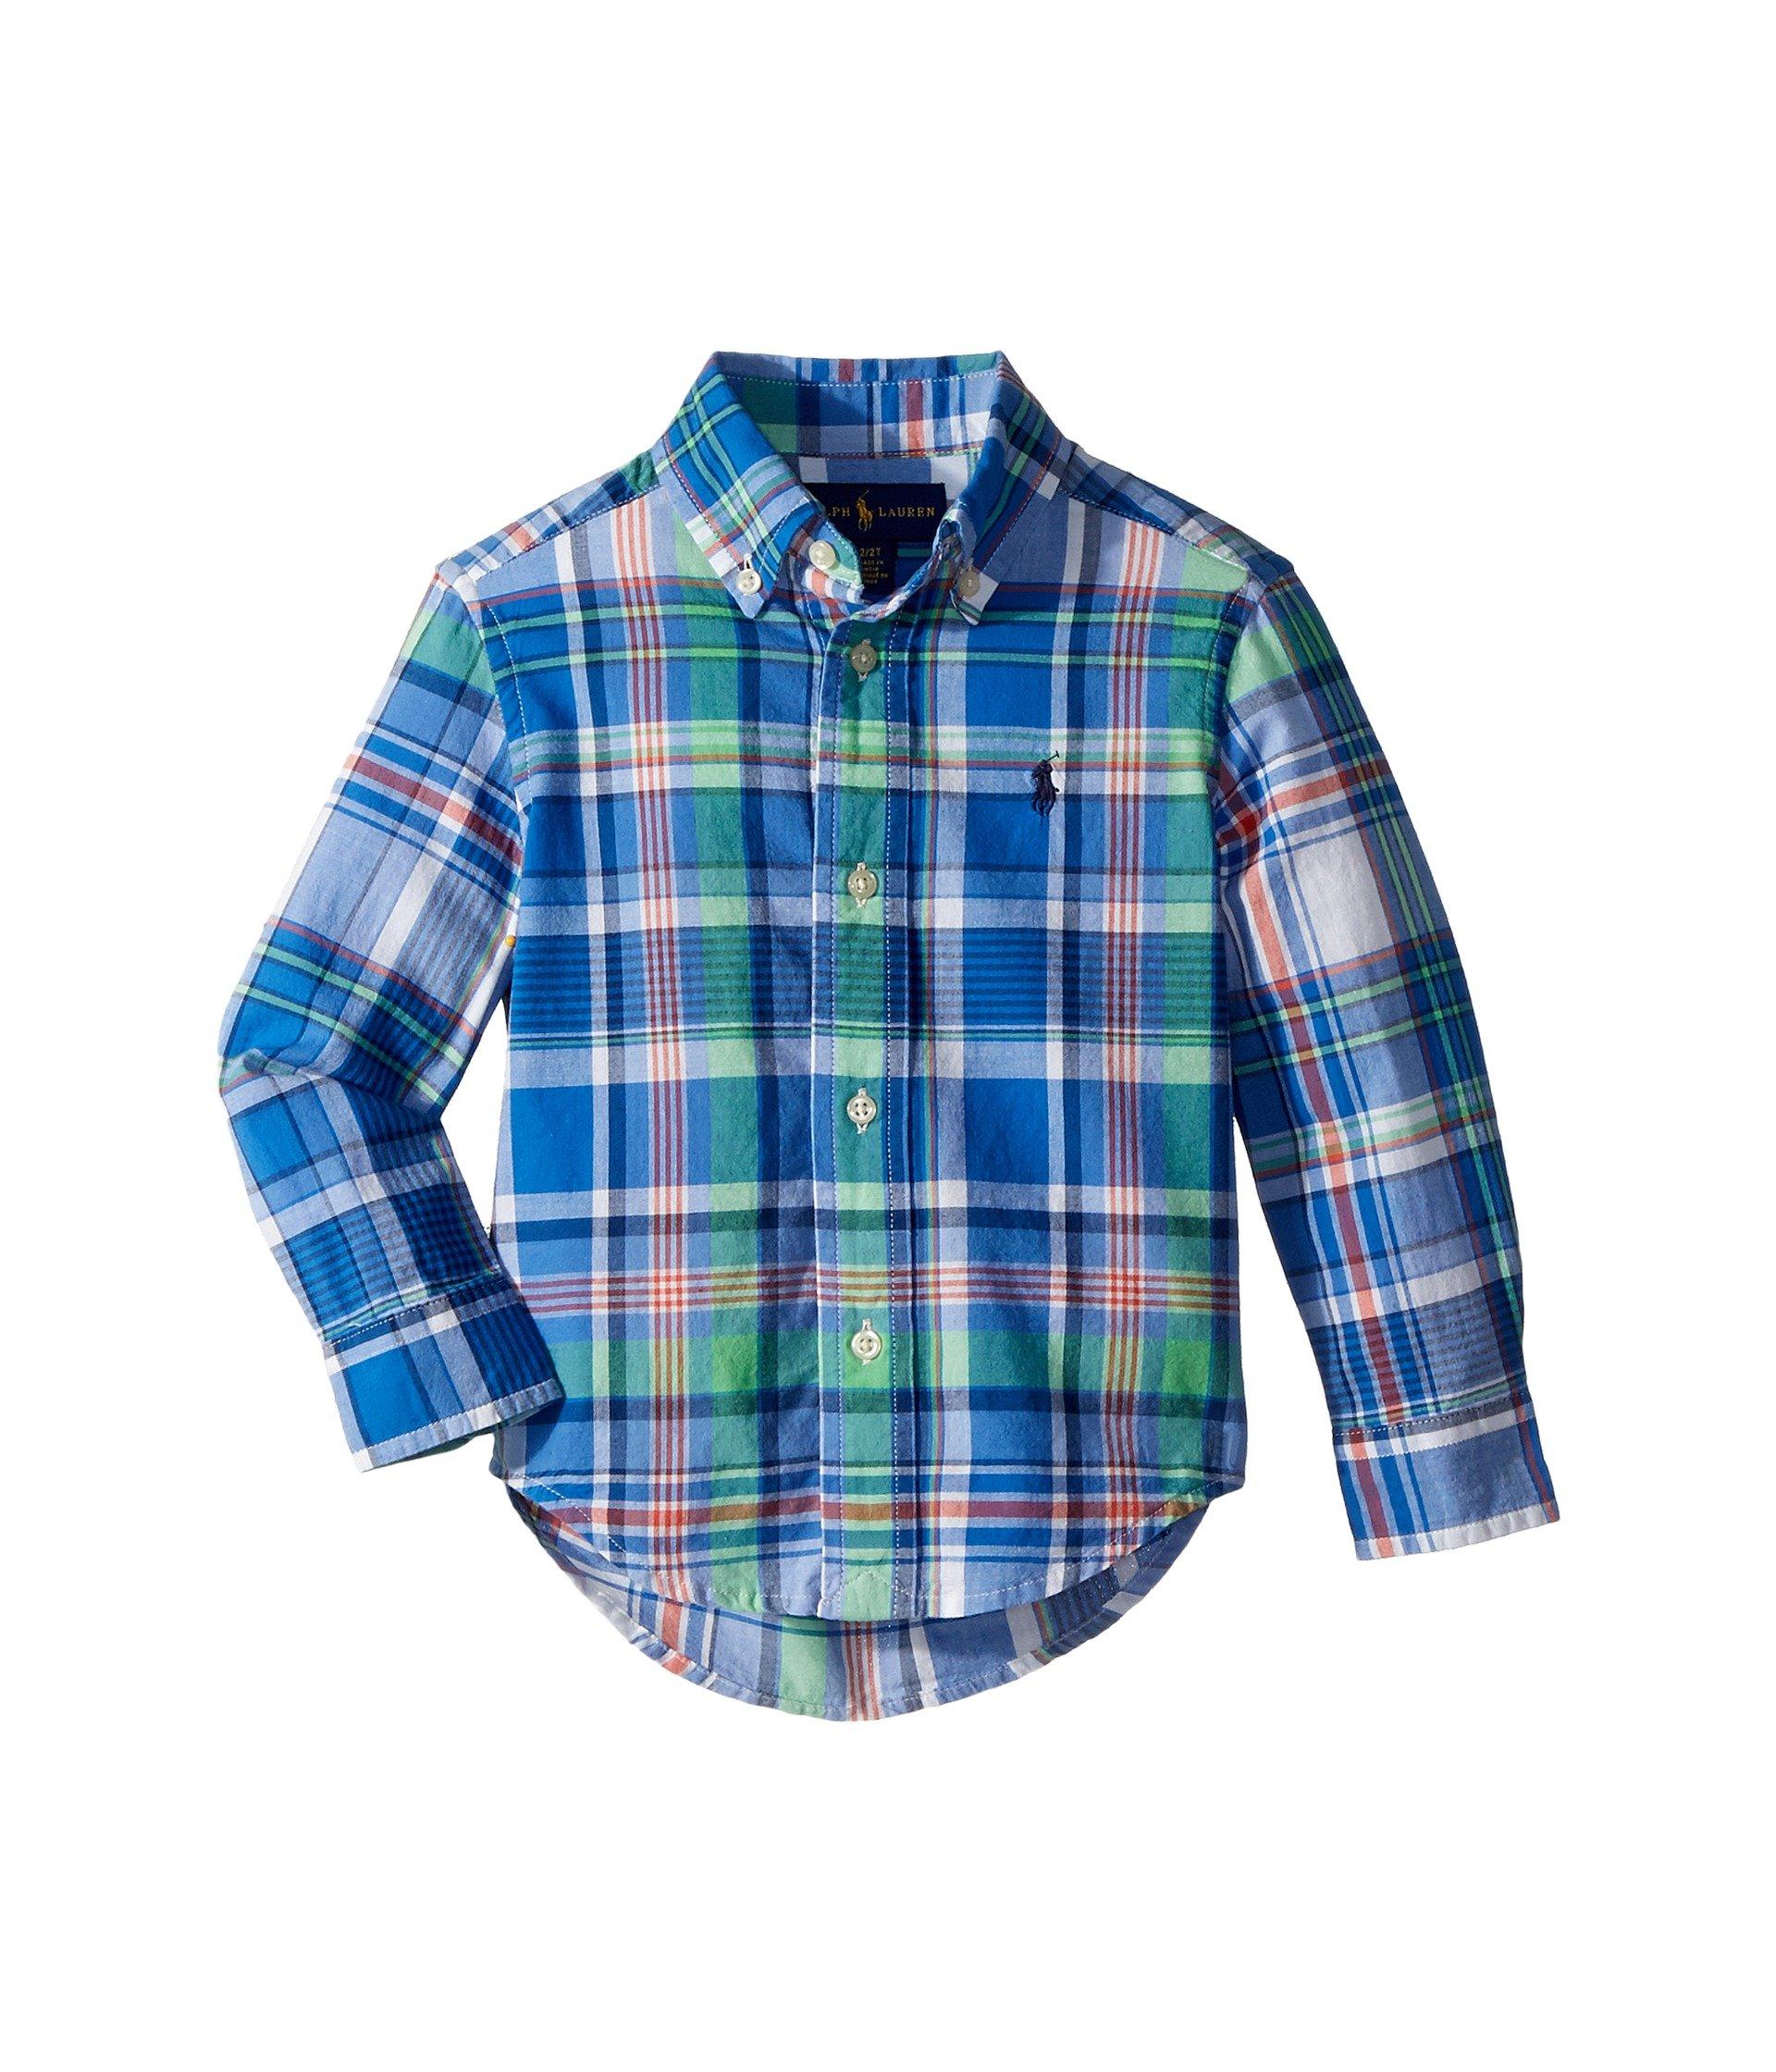 RALPH LAUREN Polo Boys Plaid Cotton Long Sleeve Shirt (2T Toddler)